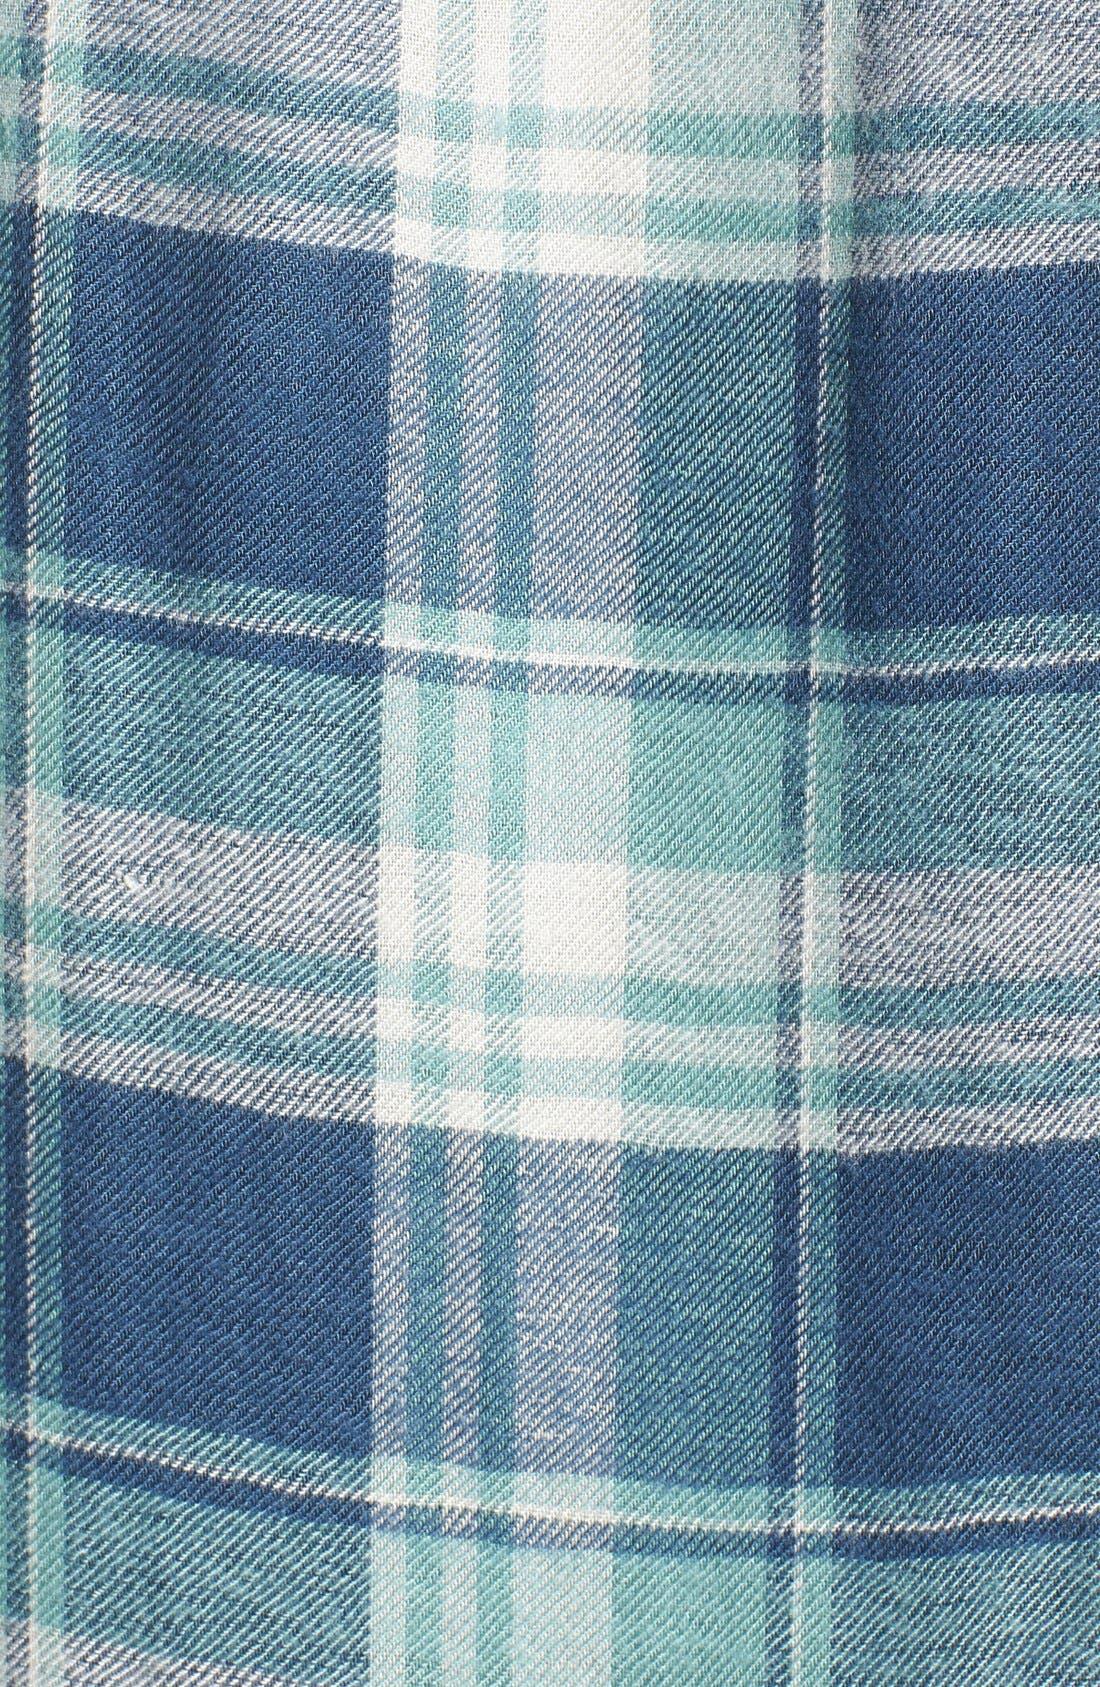 Alternate Image 4  - Paige Denim 'Trudy' Plaid Shirt